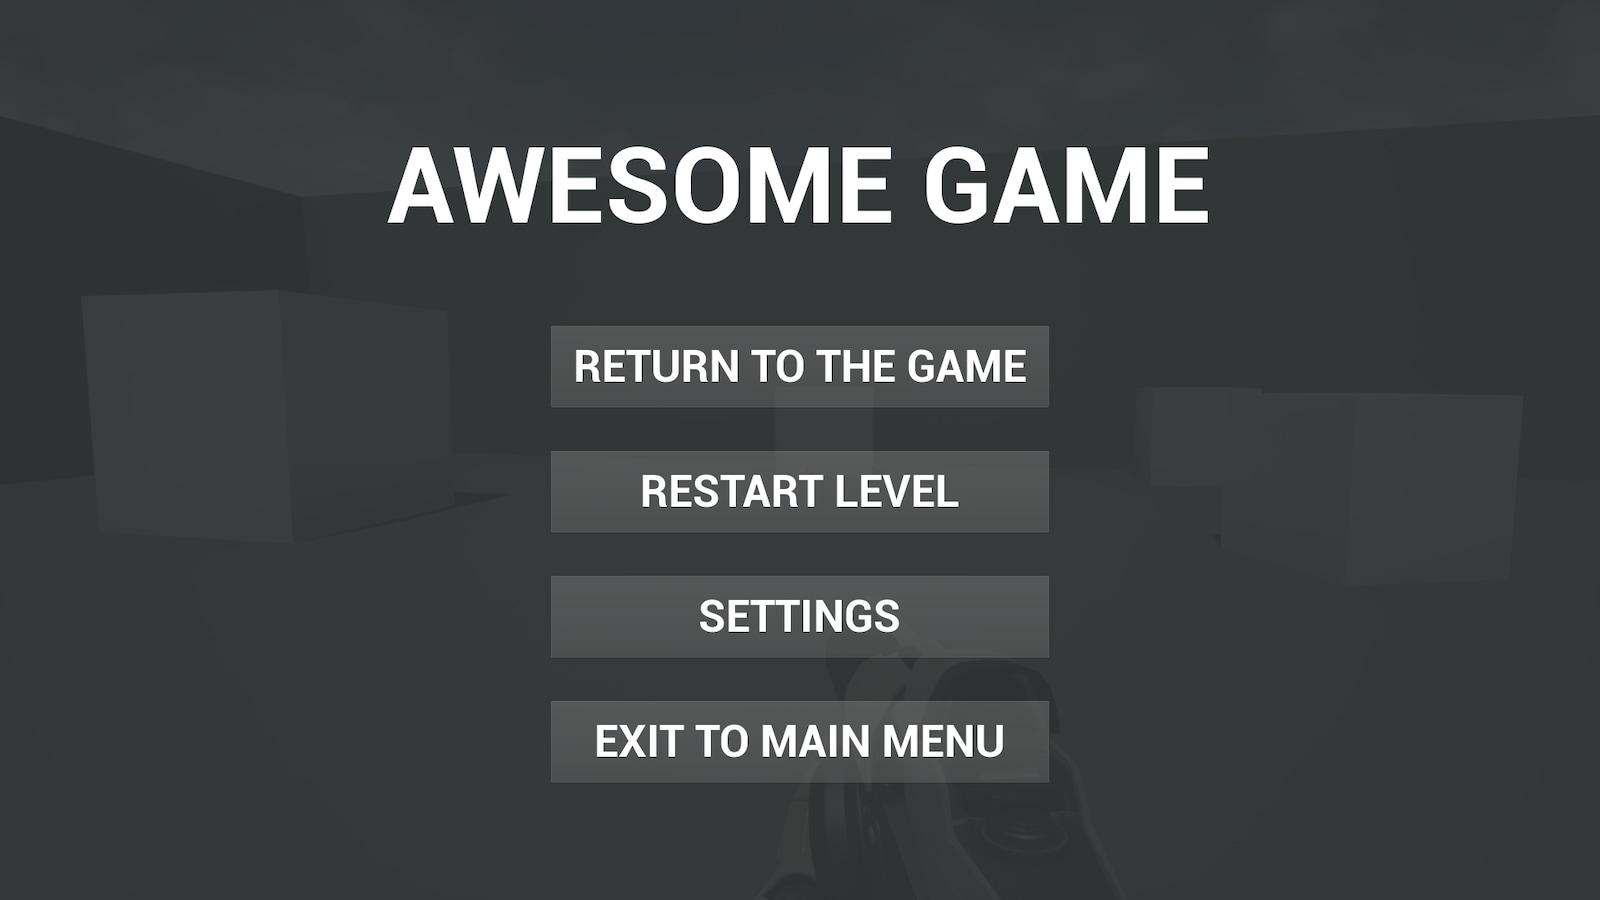 Customizable settings menu (main menu and pause game menu are included) in  Code Plugins - UE Marketplace